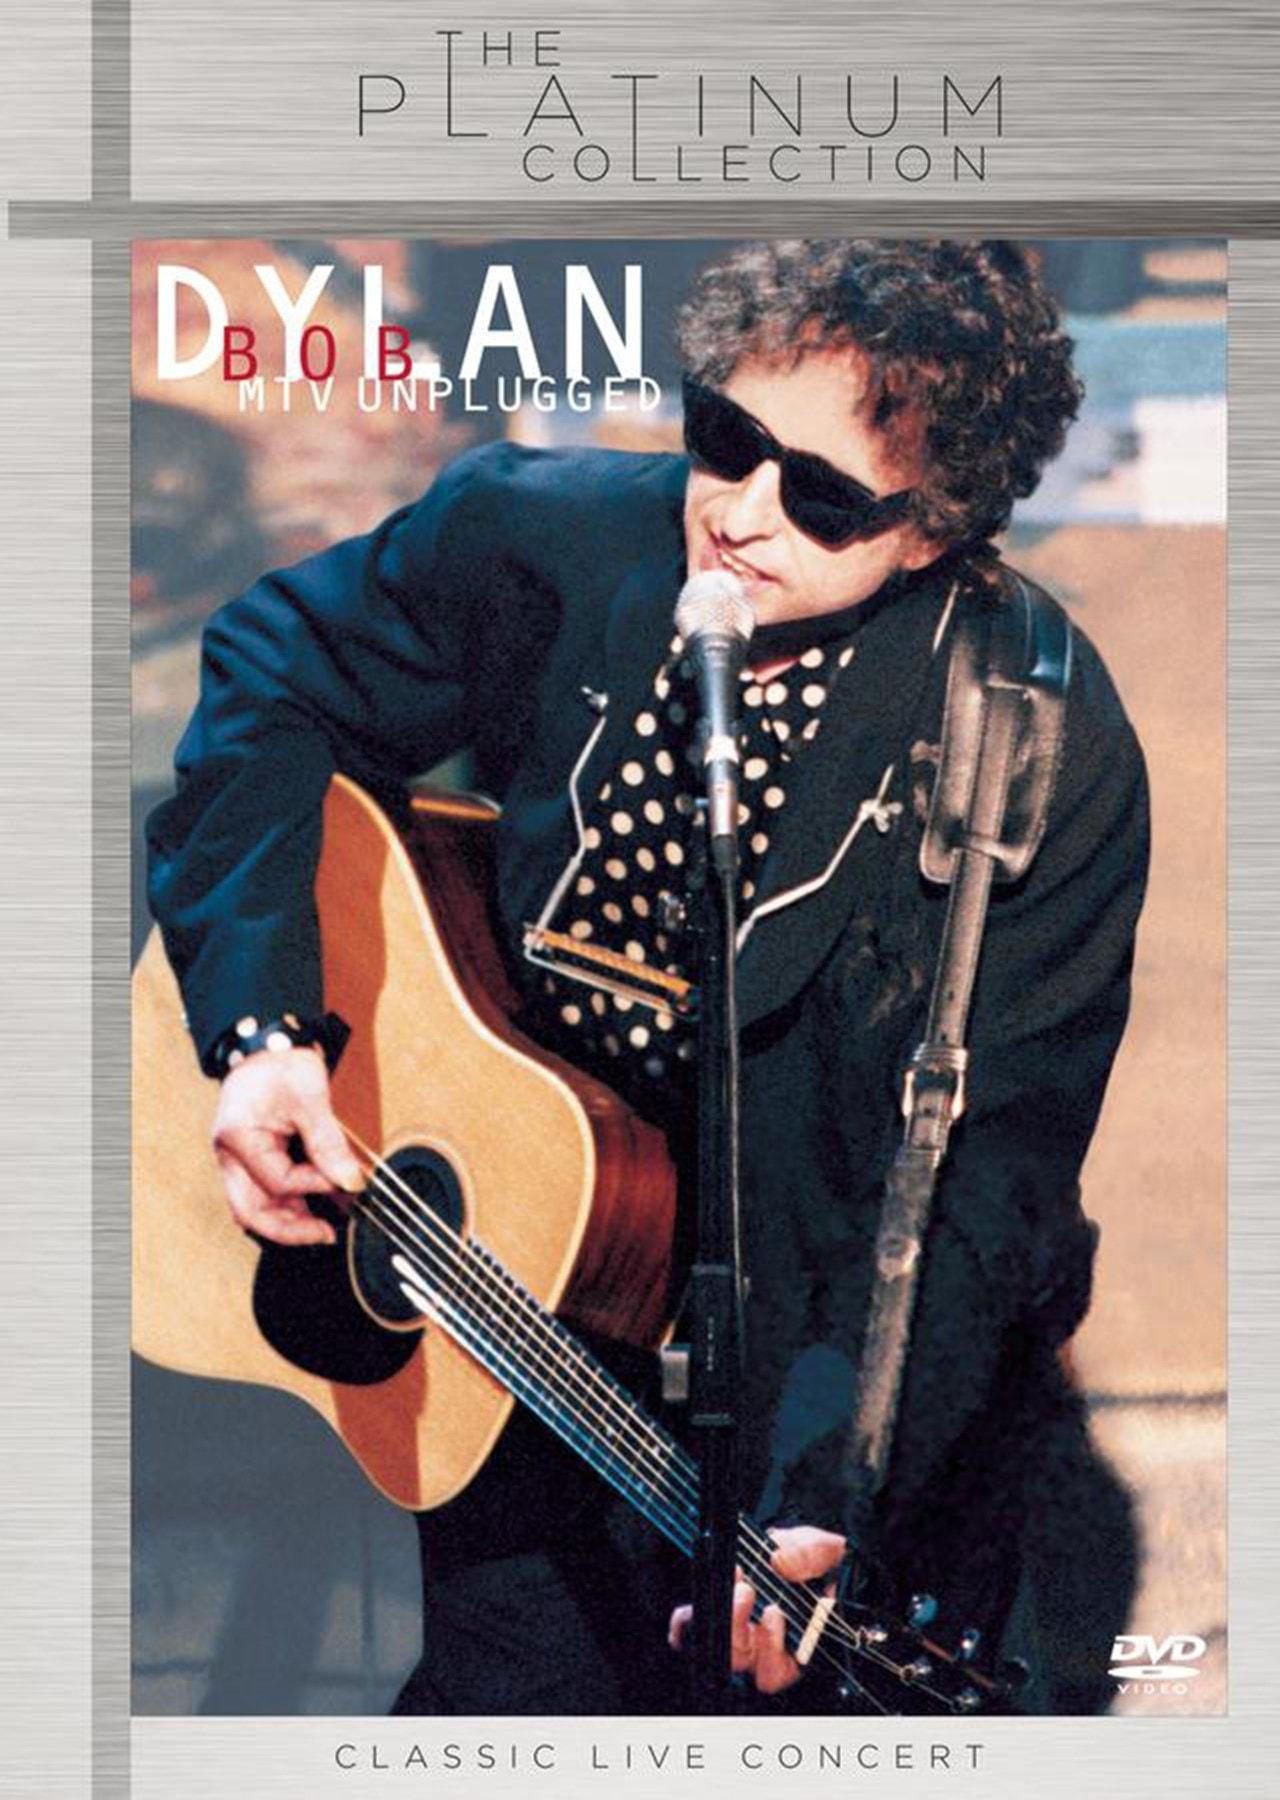 Bob Dylan: MTV Unplugged - 1